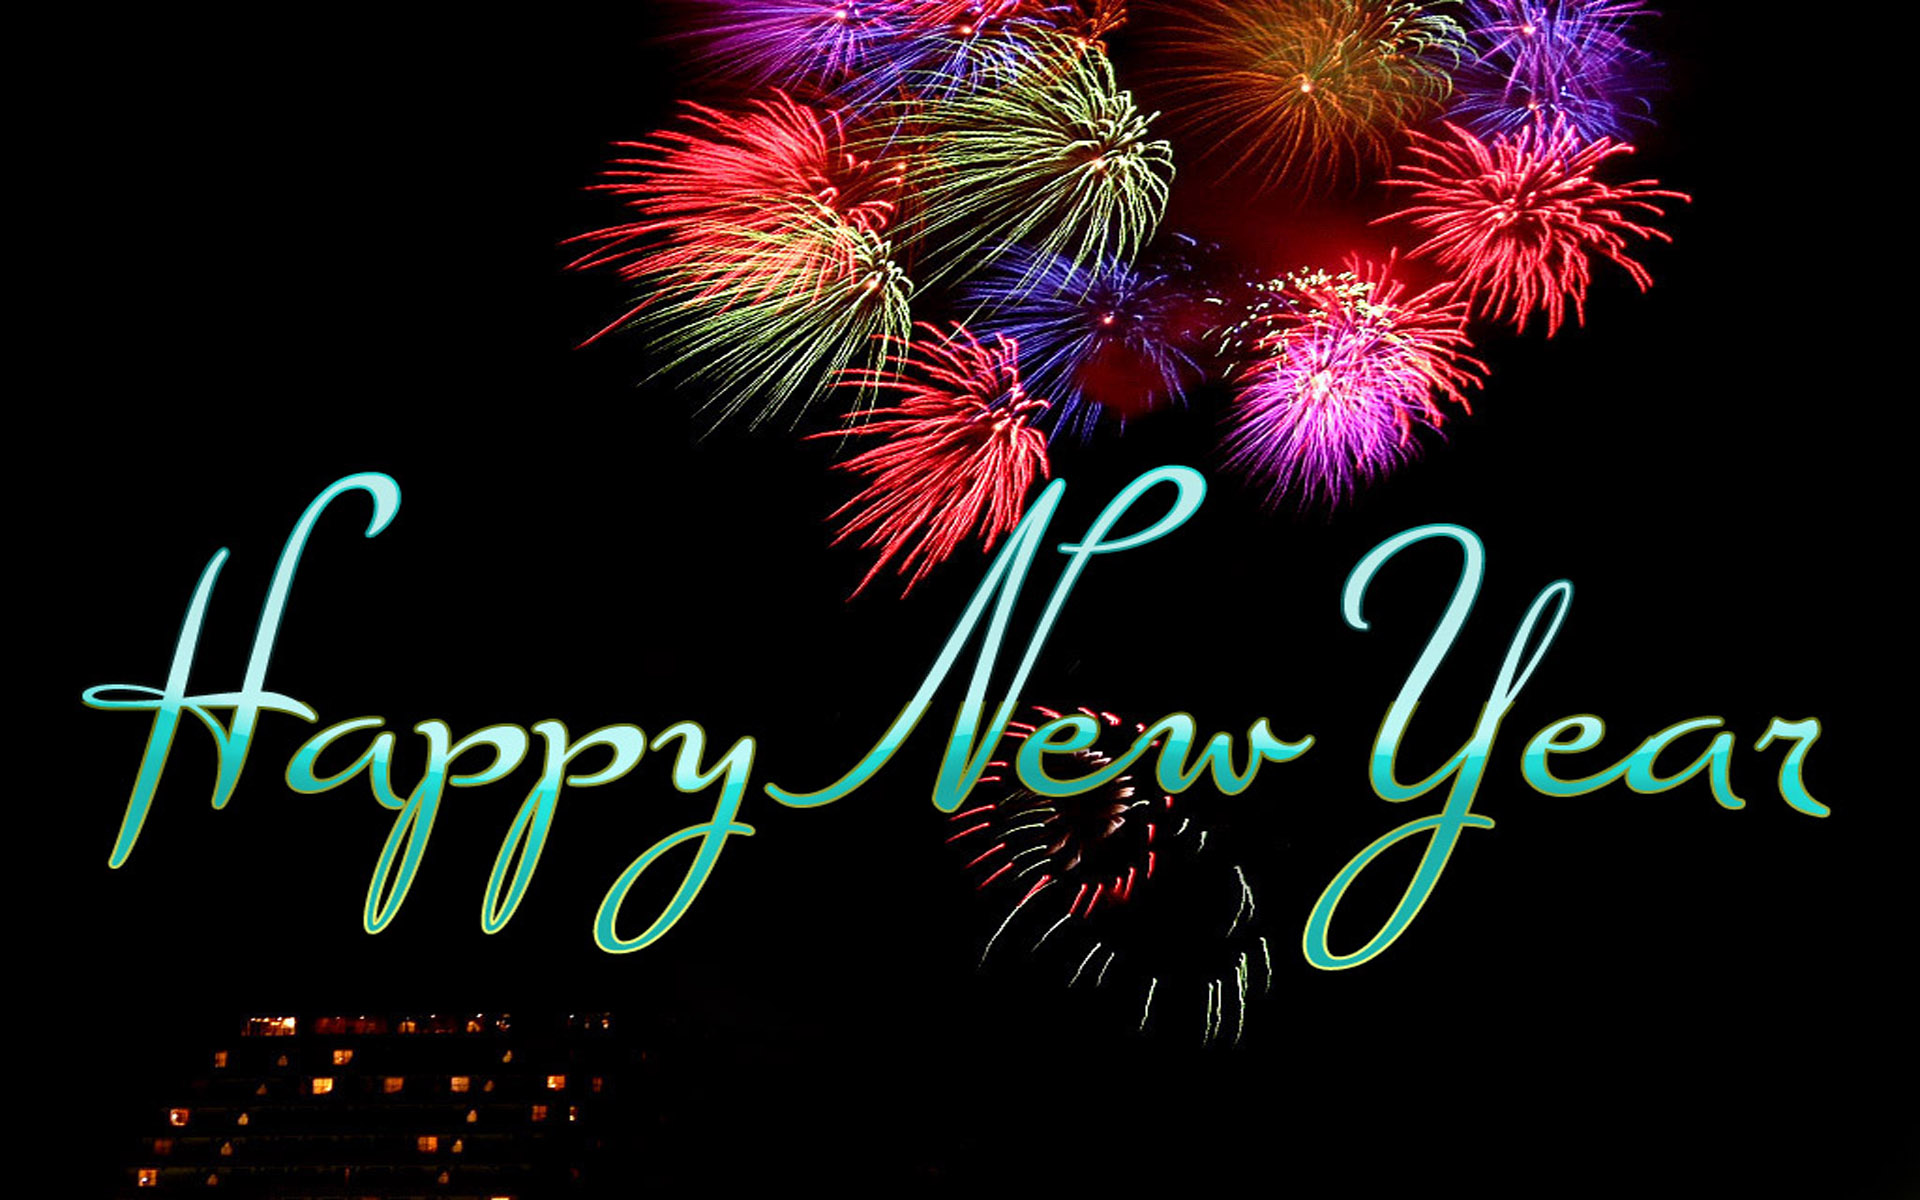 Art Happy New Year